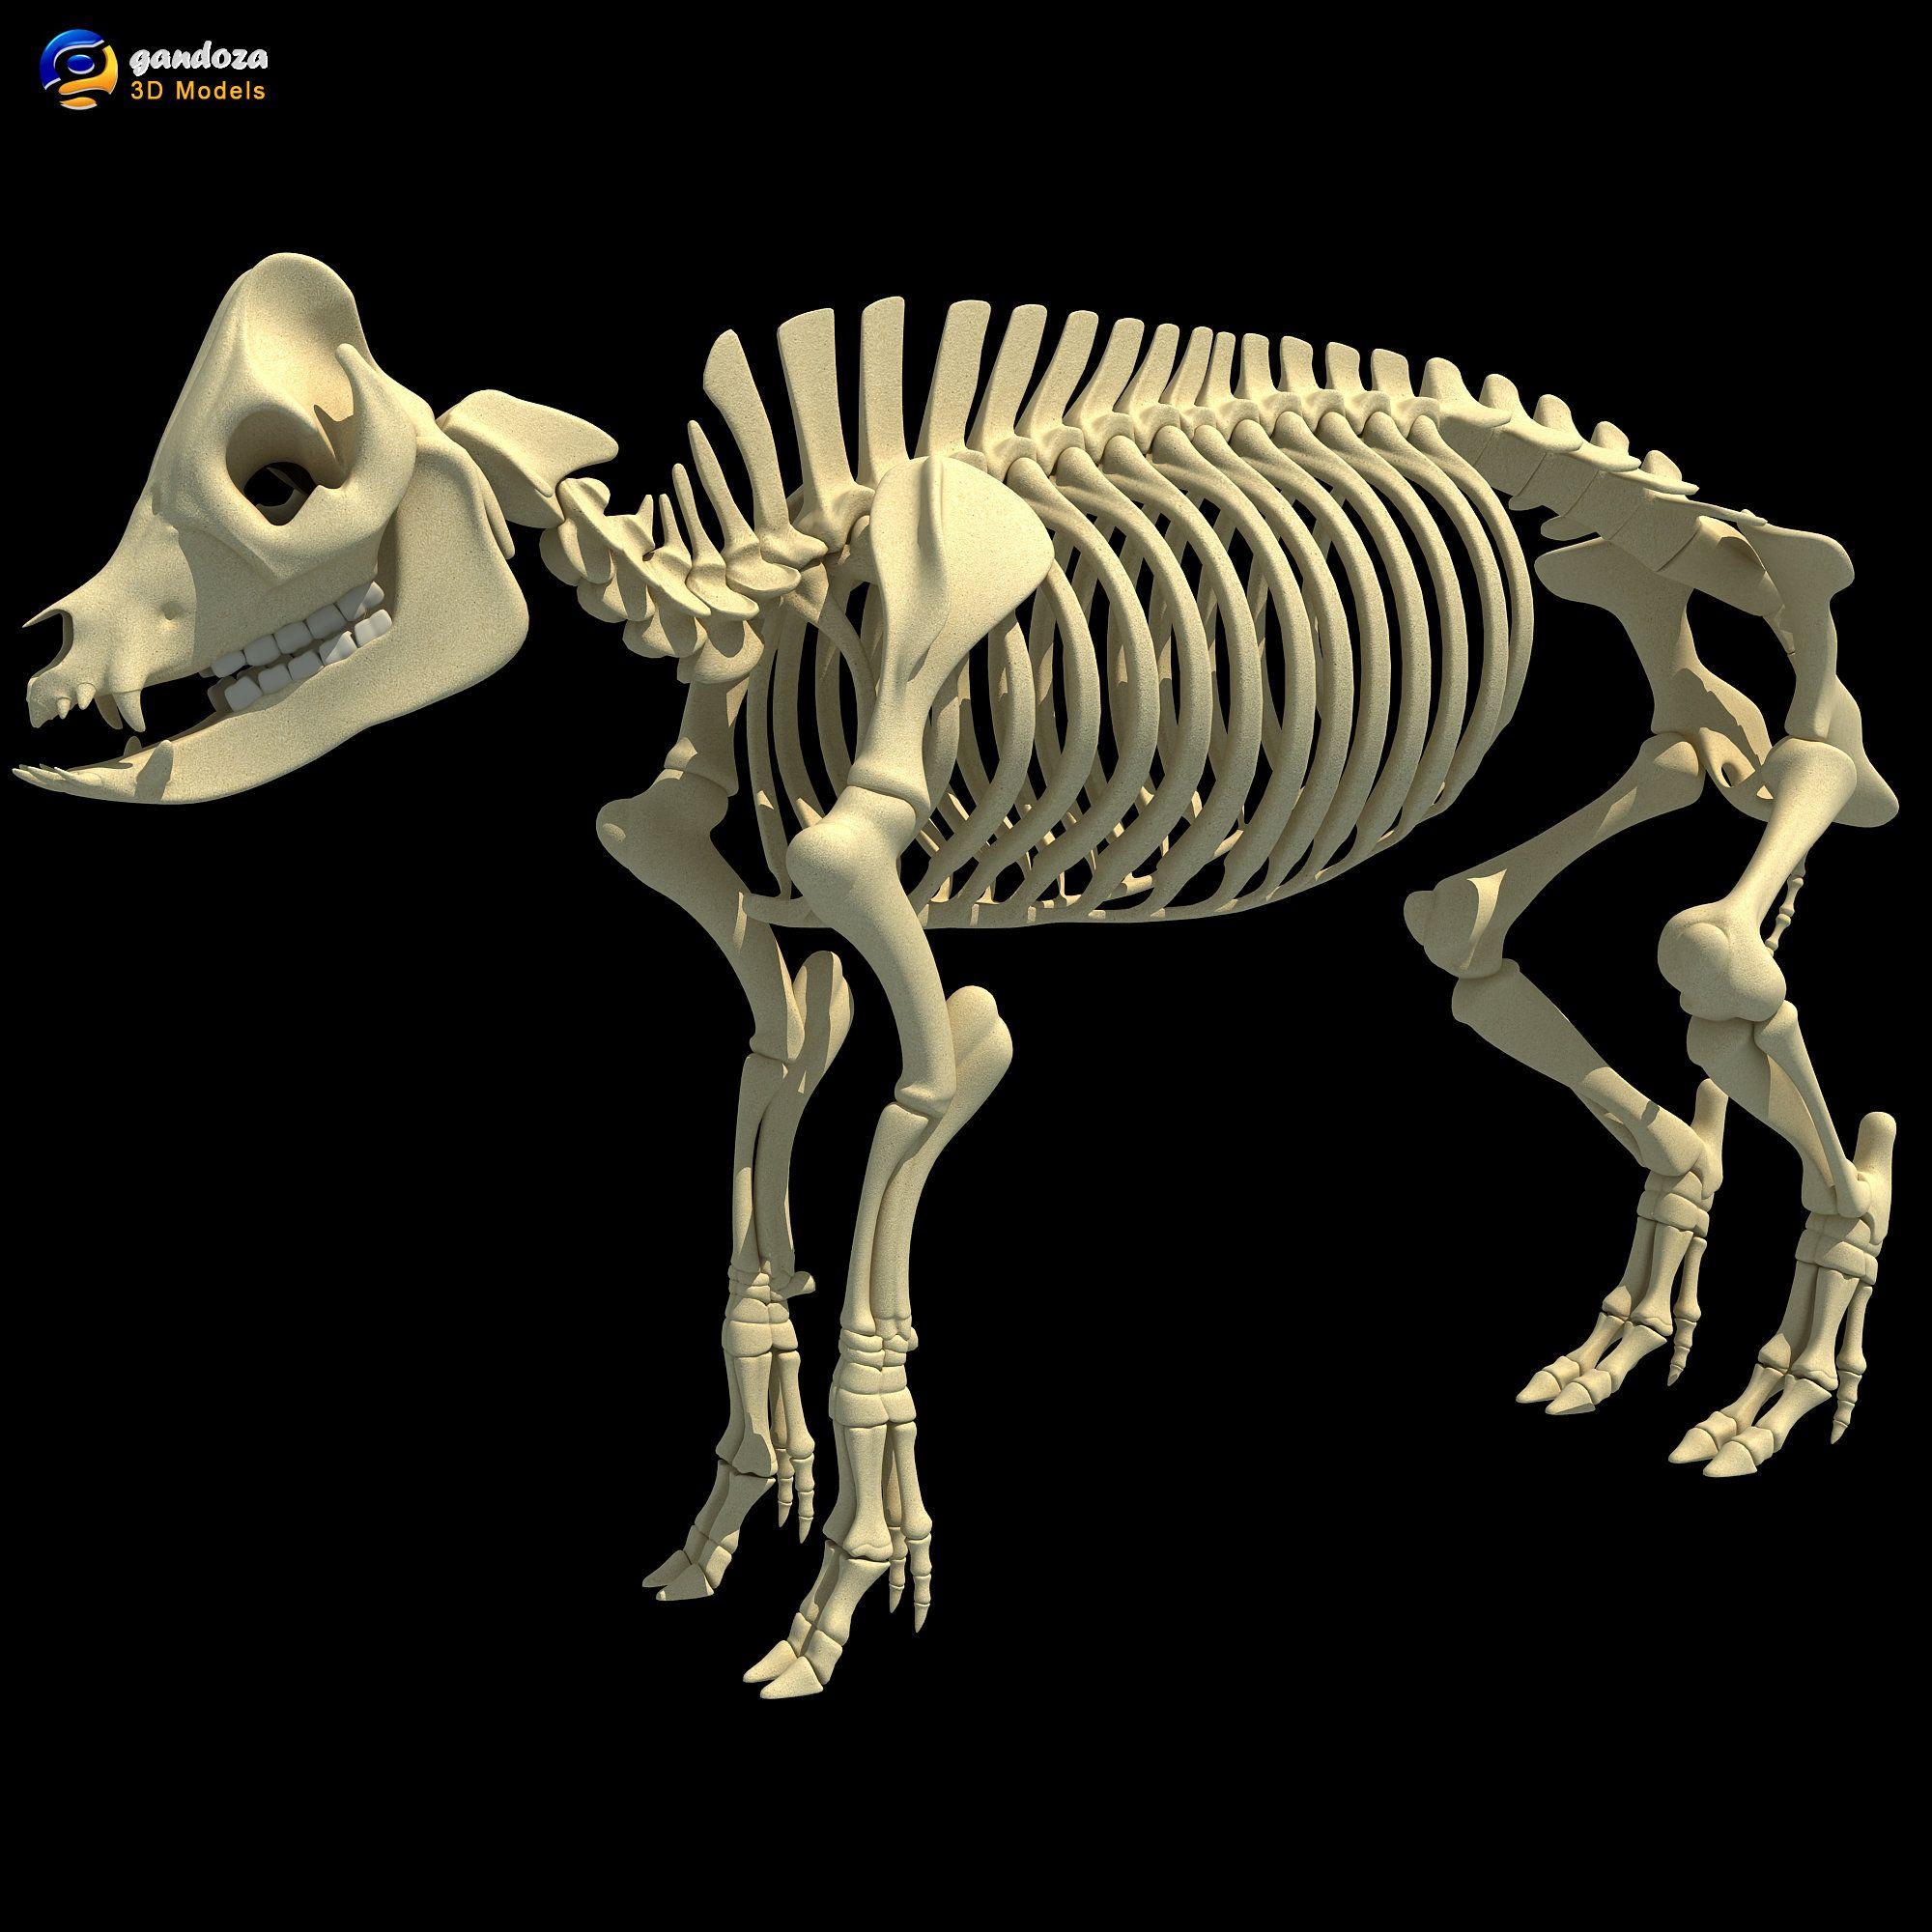 Pig Skeleton - 3D Animals by Gandoza | Animal Skeletons | Pinterest ...